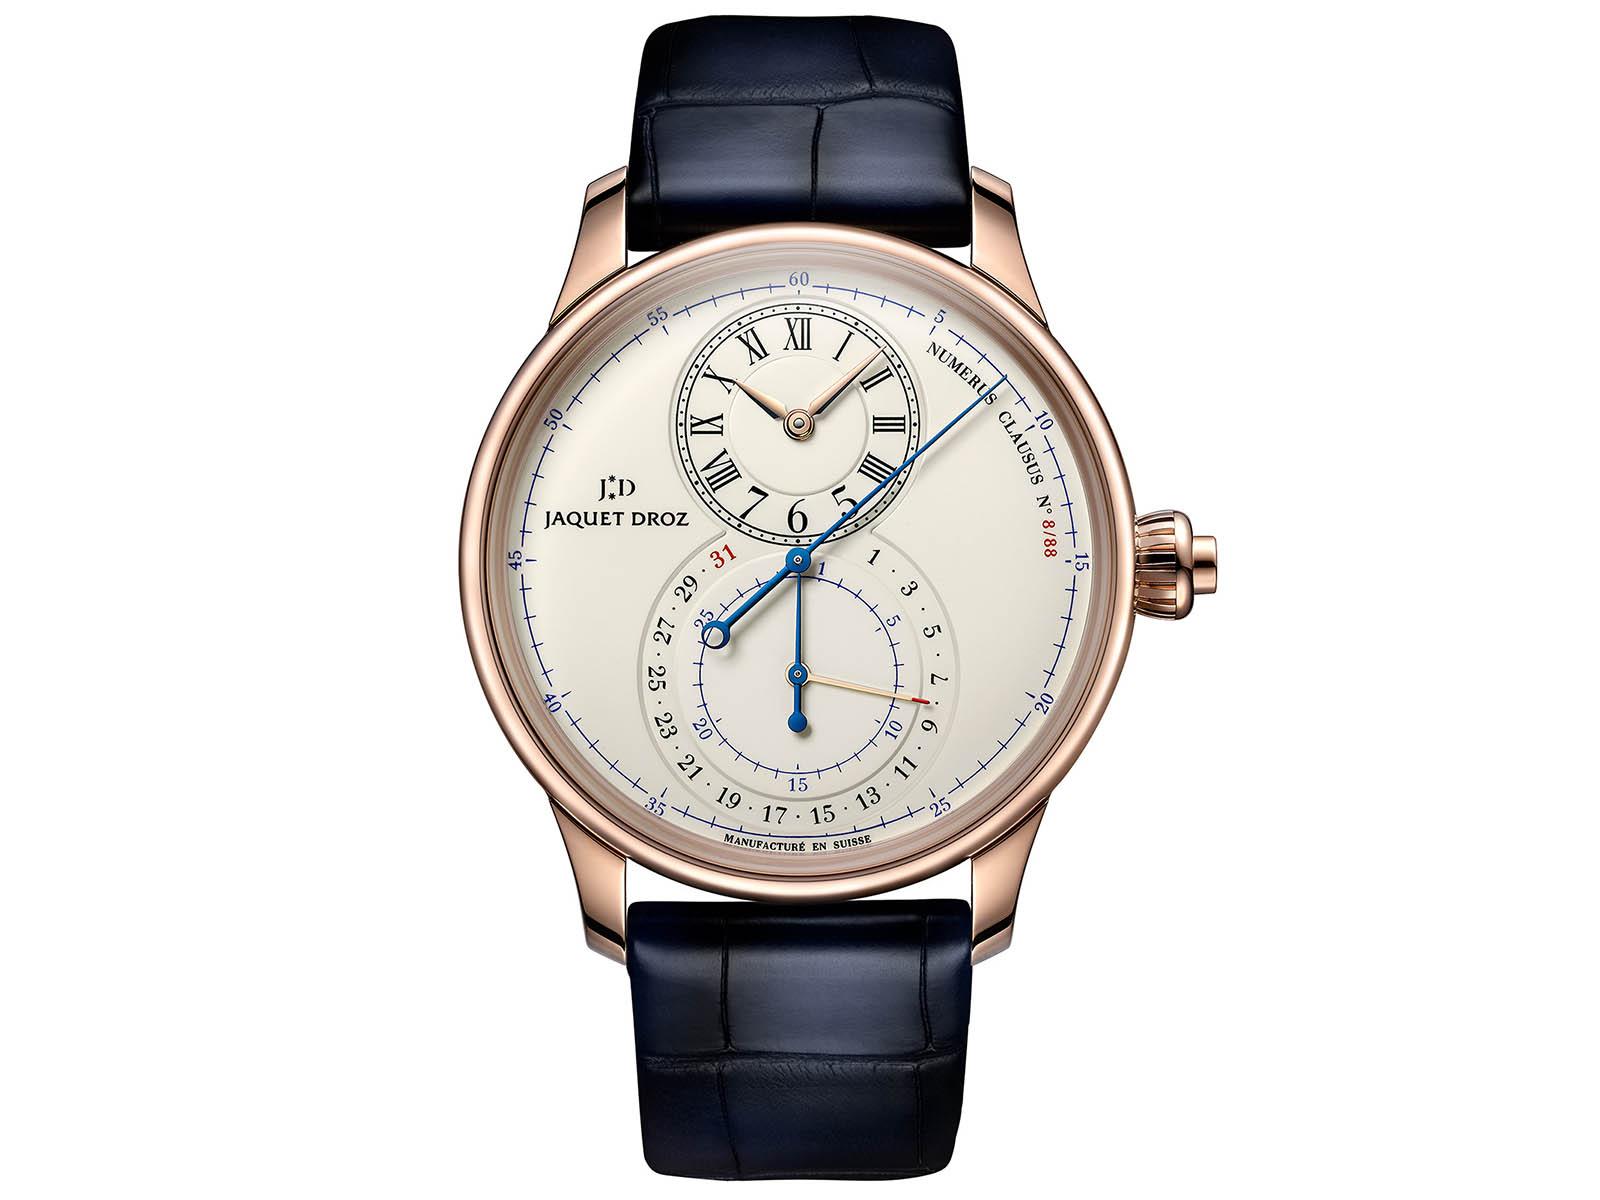 j007733200-jaquet-droz-grande-seconde-chronograph-ivory-enamel-1.jpg